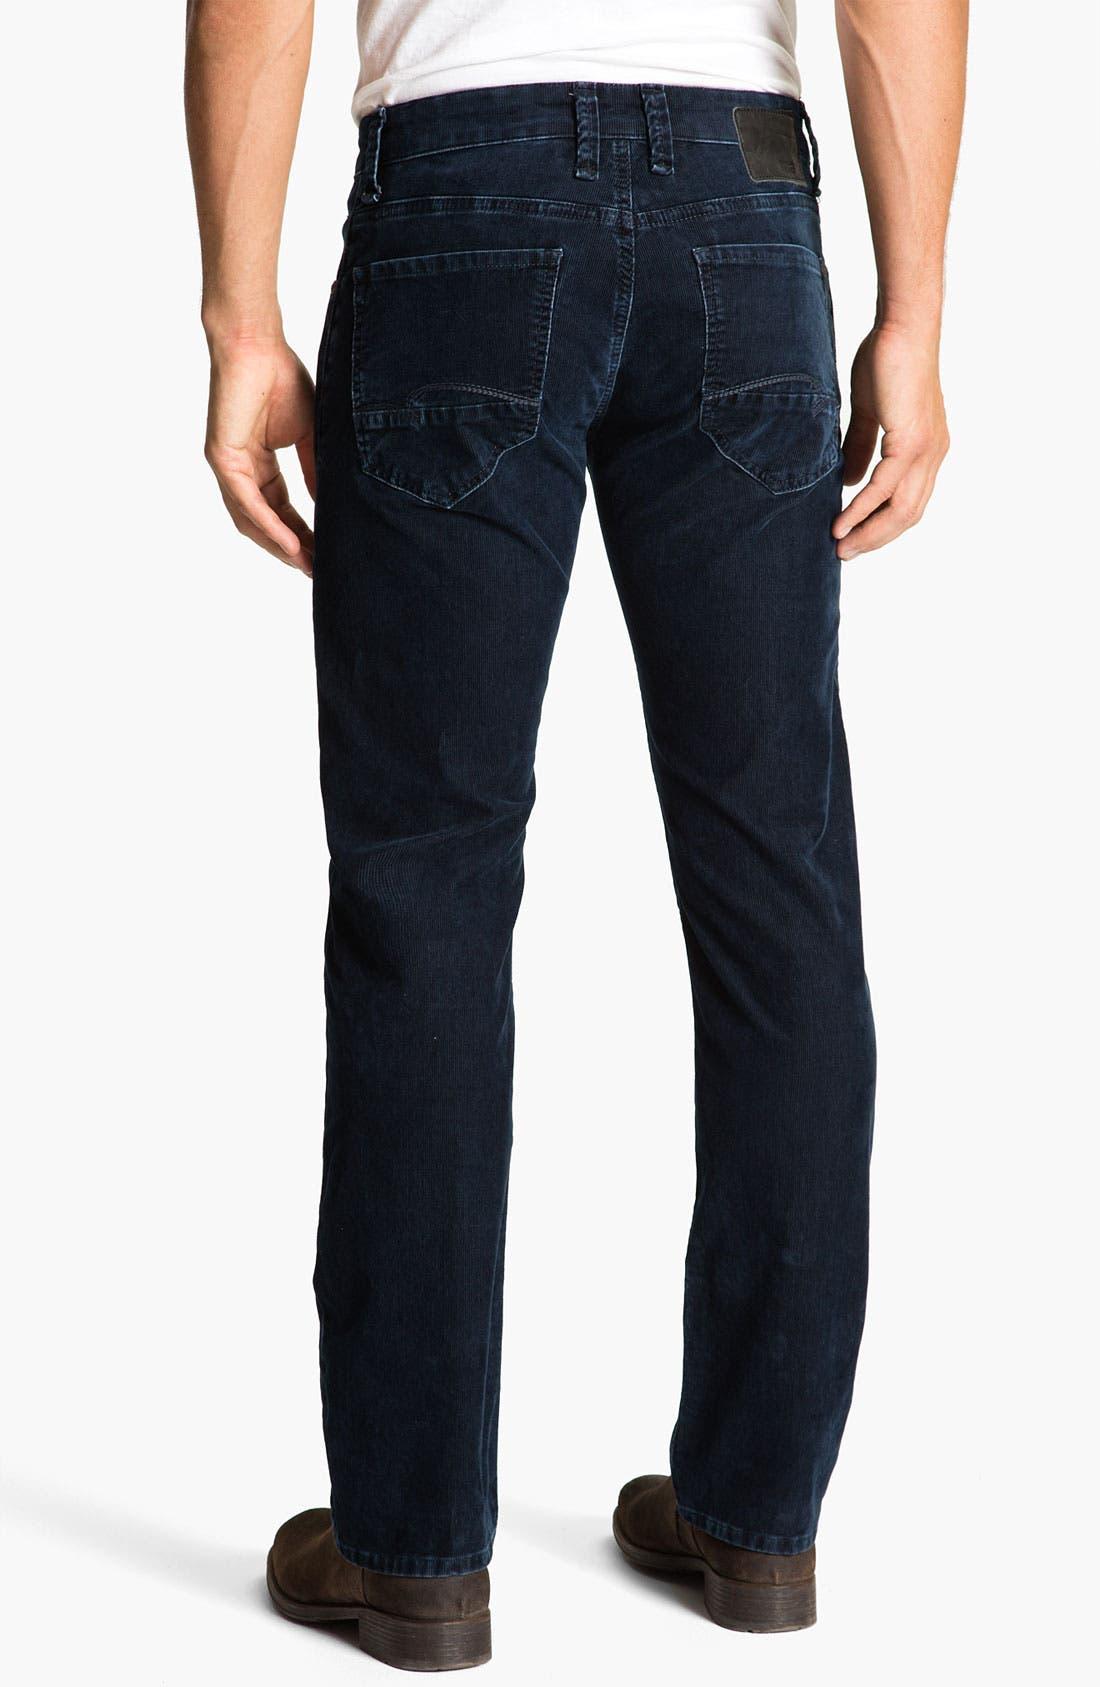 Alternate Image 1 Selected - Mavi Jeans 'Zach' Low Rise Straight Leg Corduroy Pants